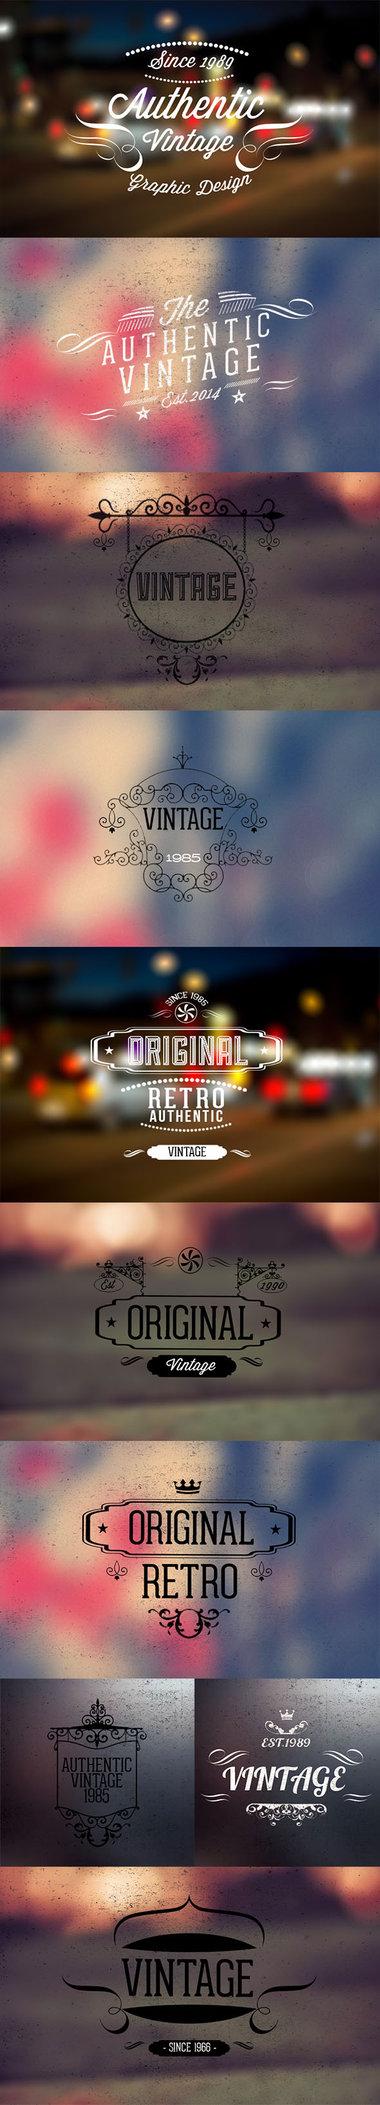 10 Vintage Retro Logo & Insignia Templates PSD